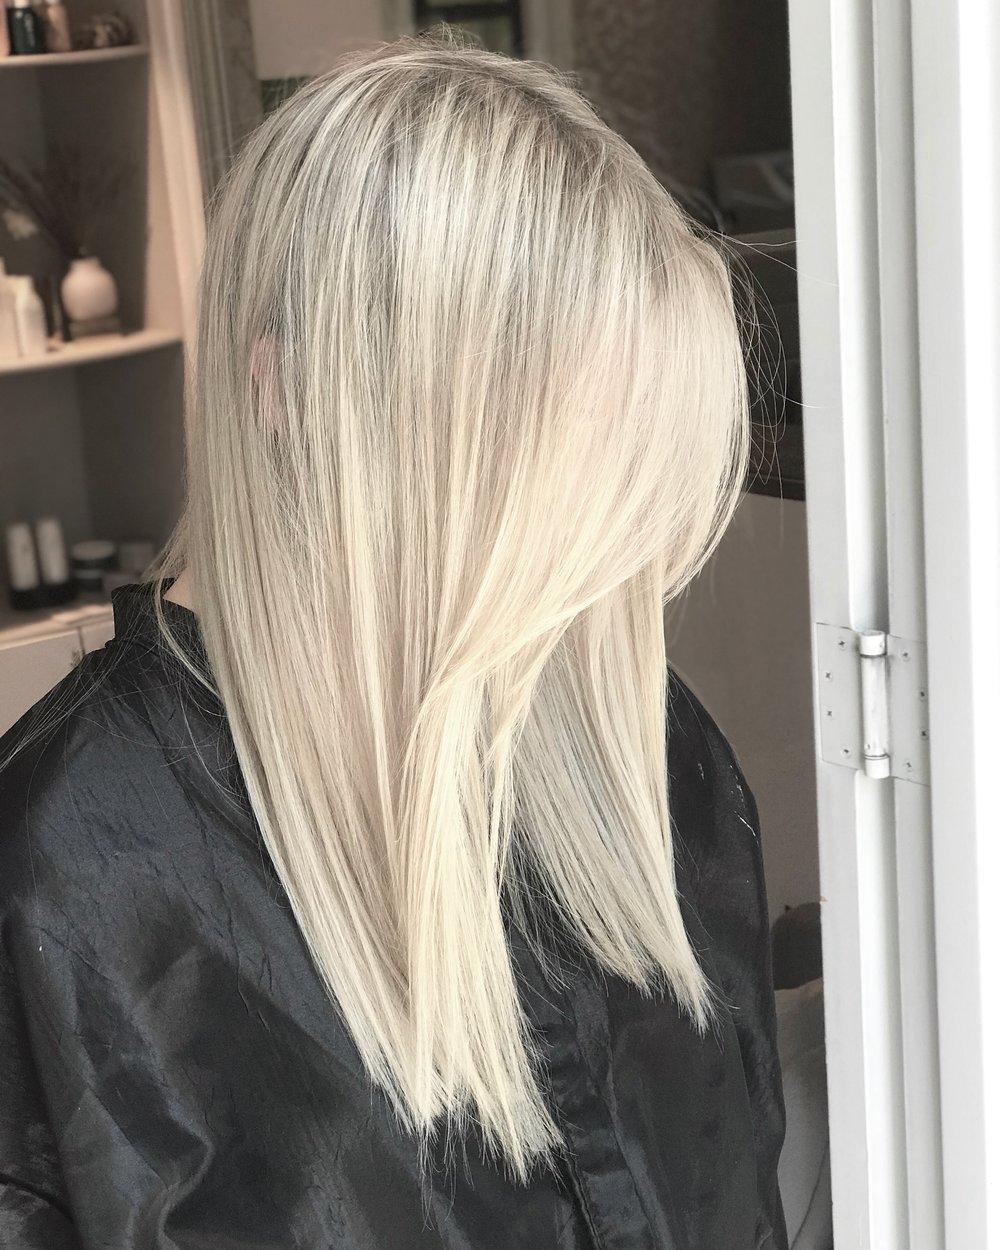 Blonde-Mauricio hair.JPG